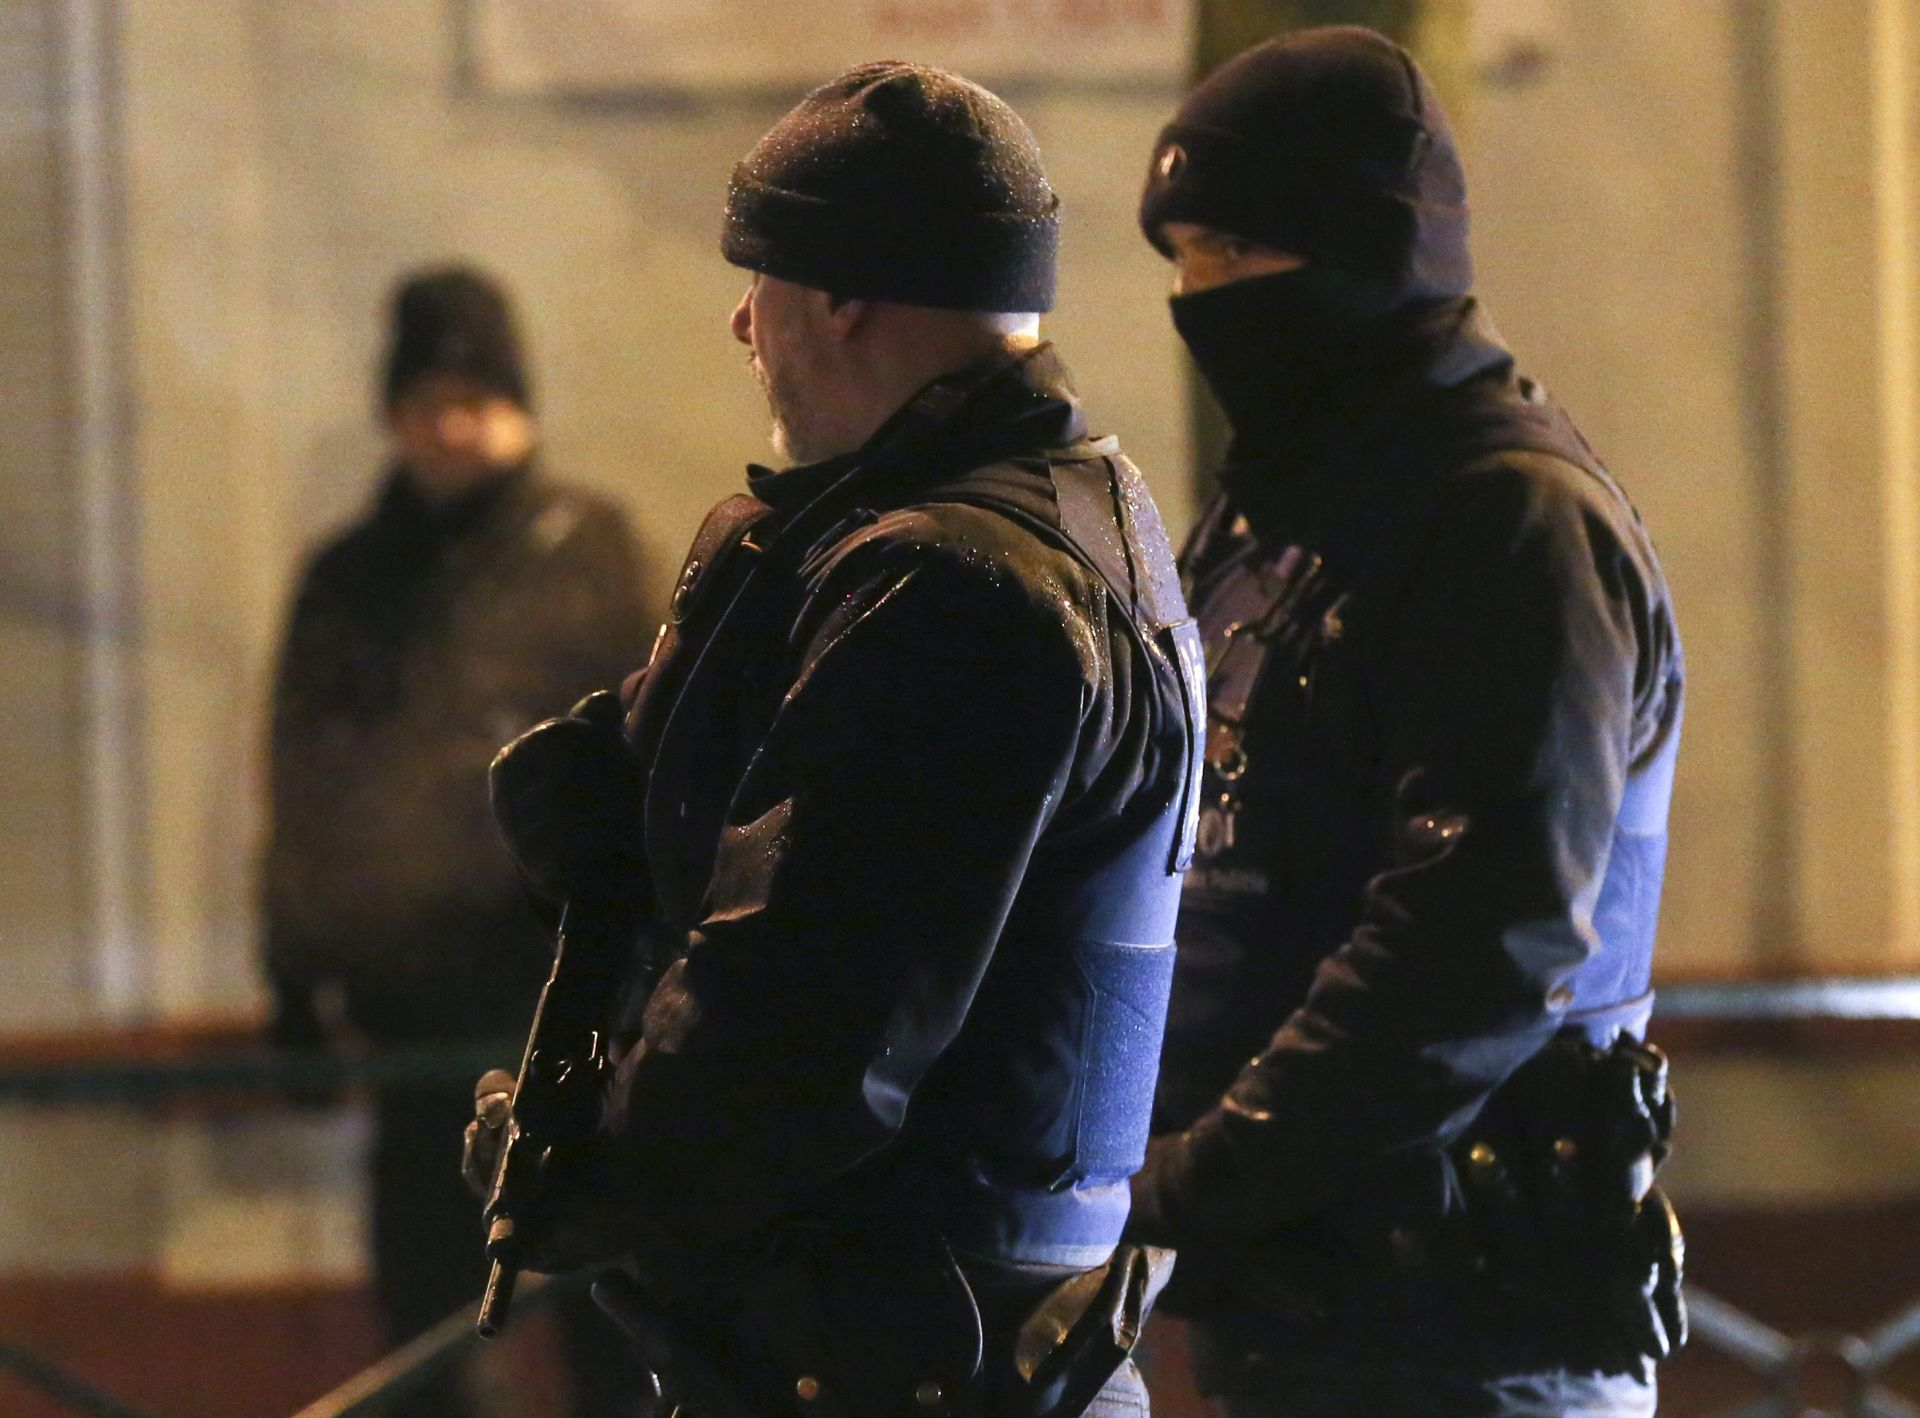 BRUXELLES U tijeku protuteroristička operacija